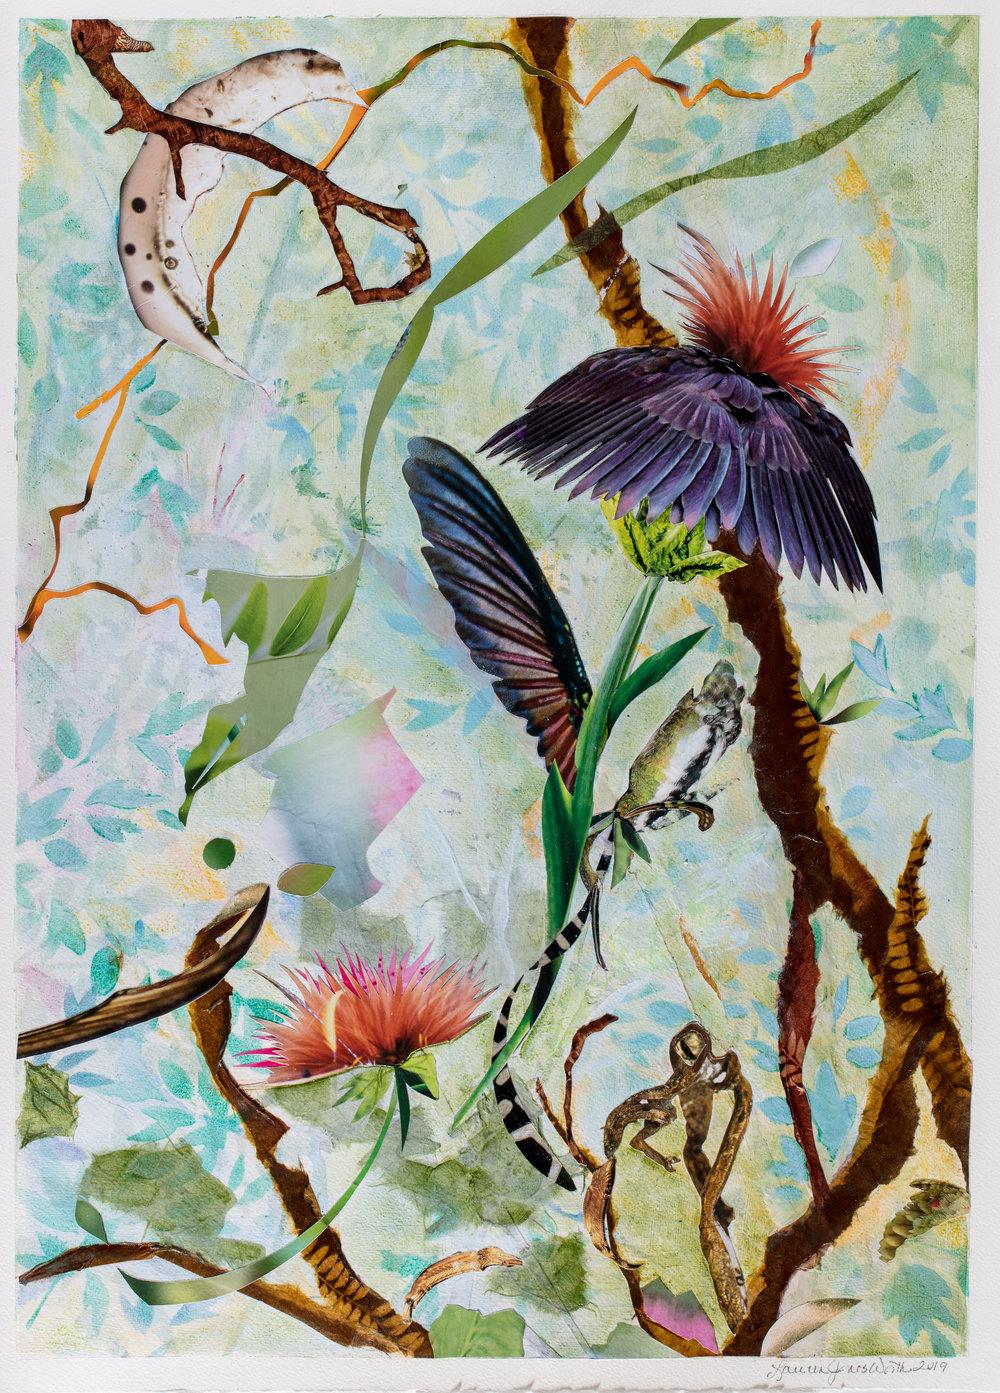 TREE SPIRITS VII, 22x16 on paper (2019)